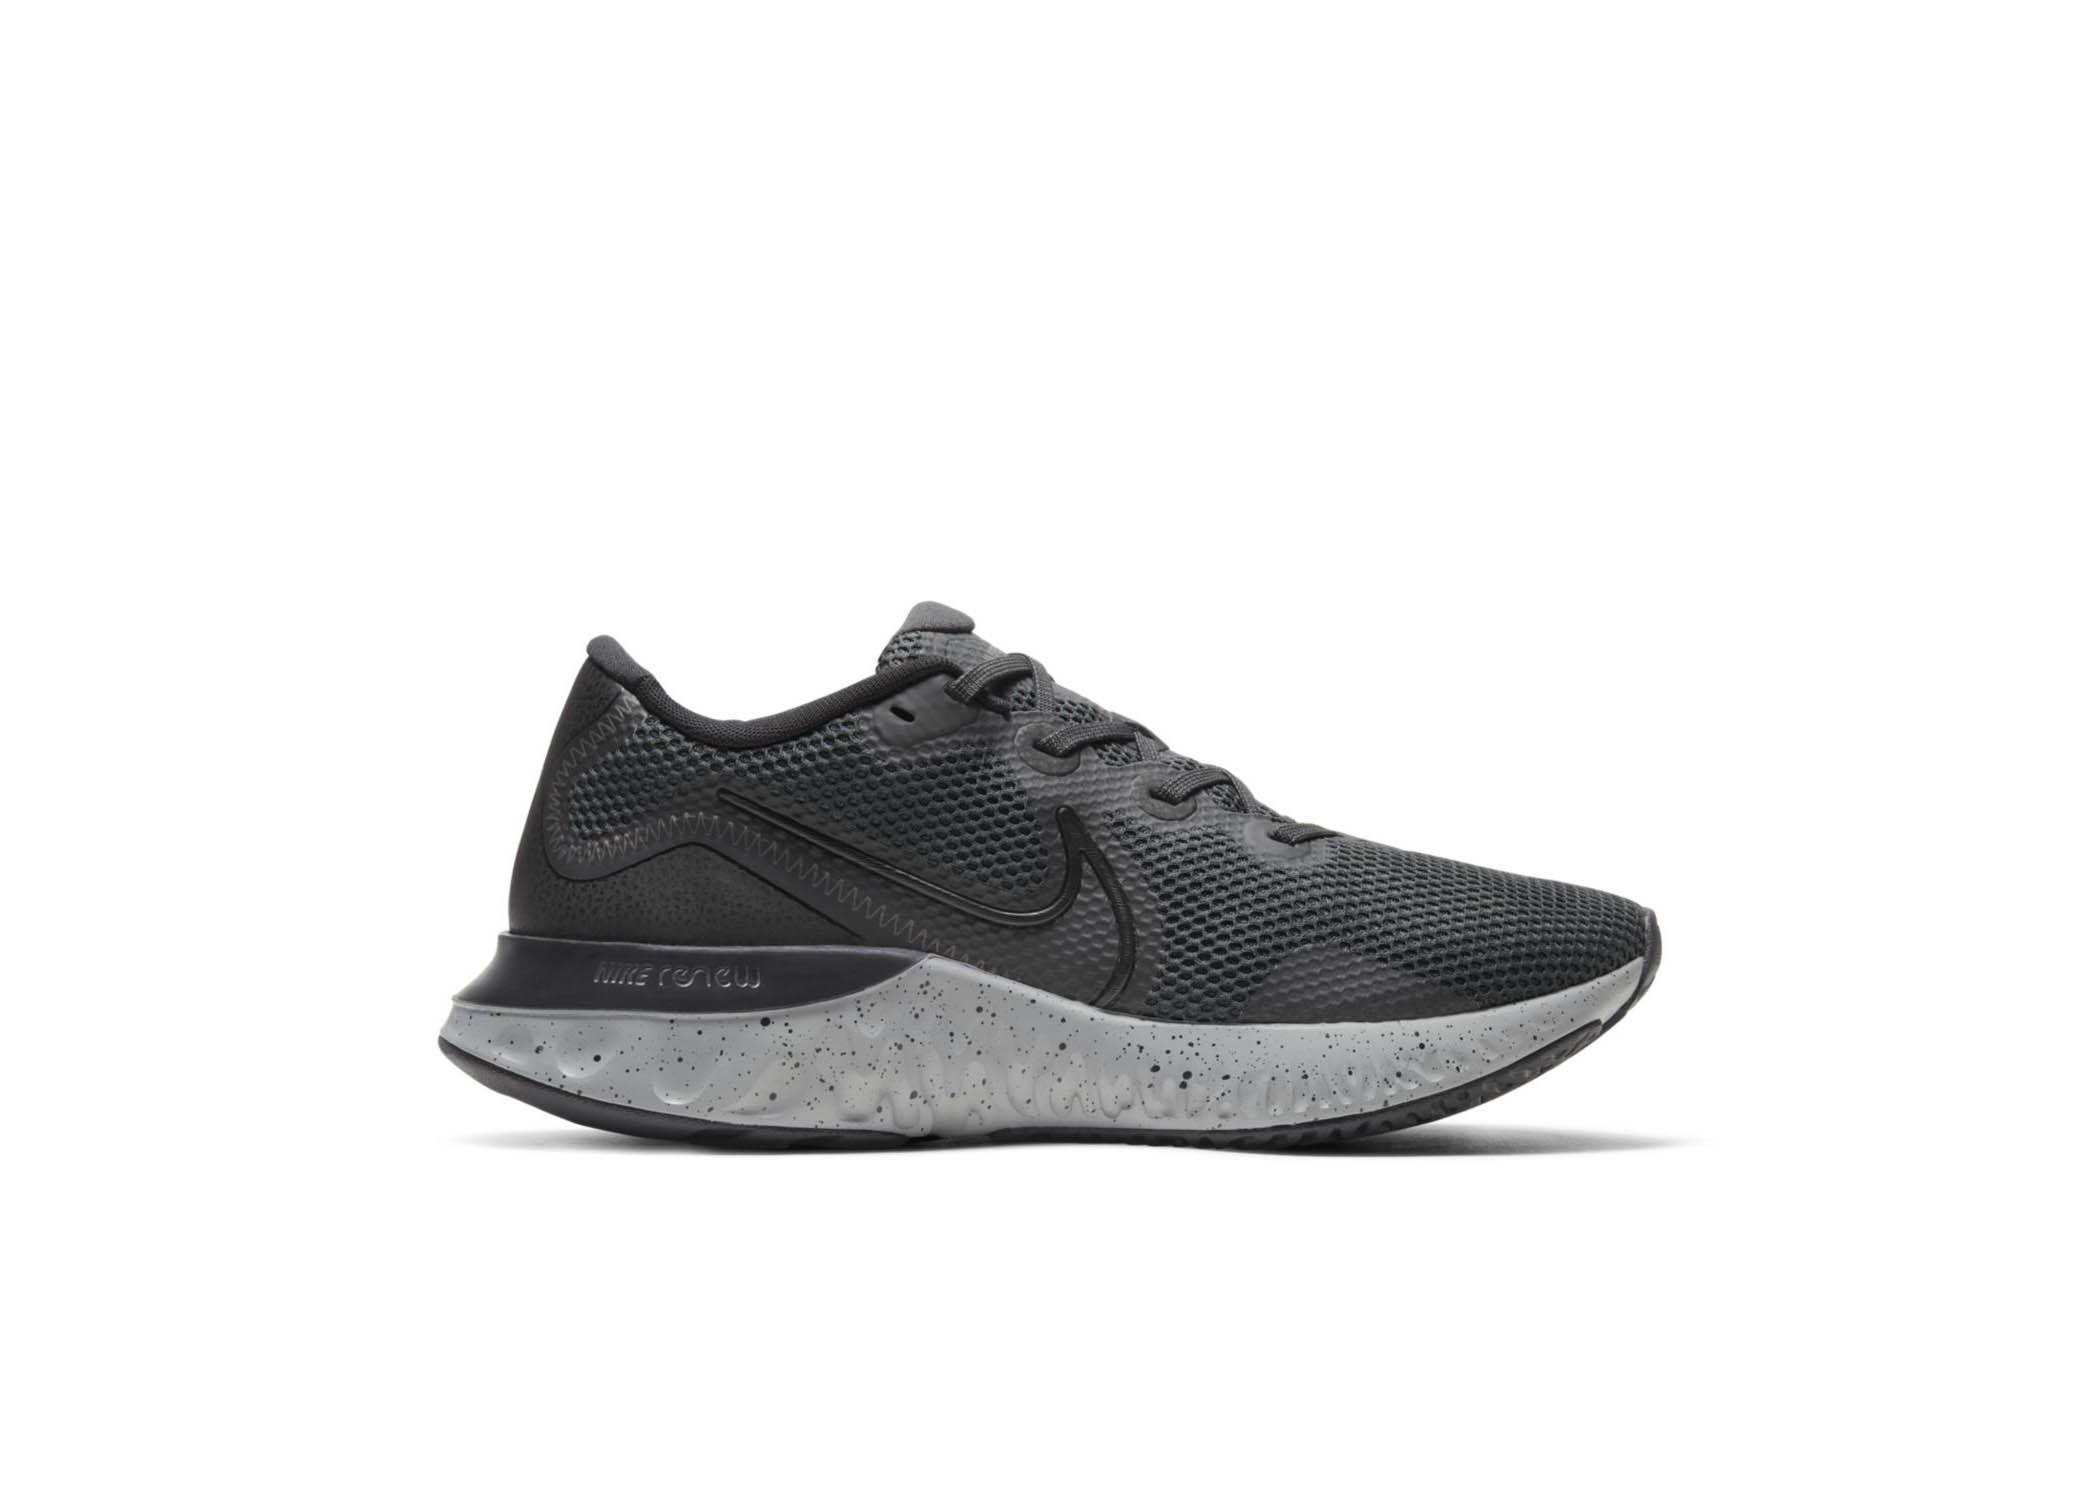 Nike Renew Run Anthracite - CZ9263-001